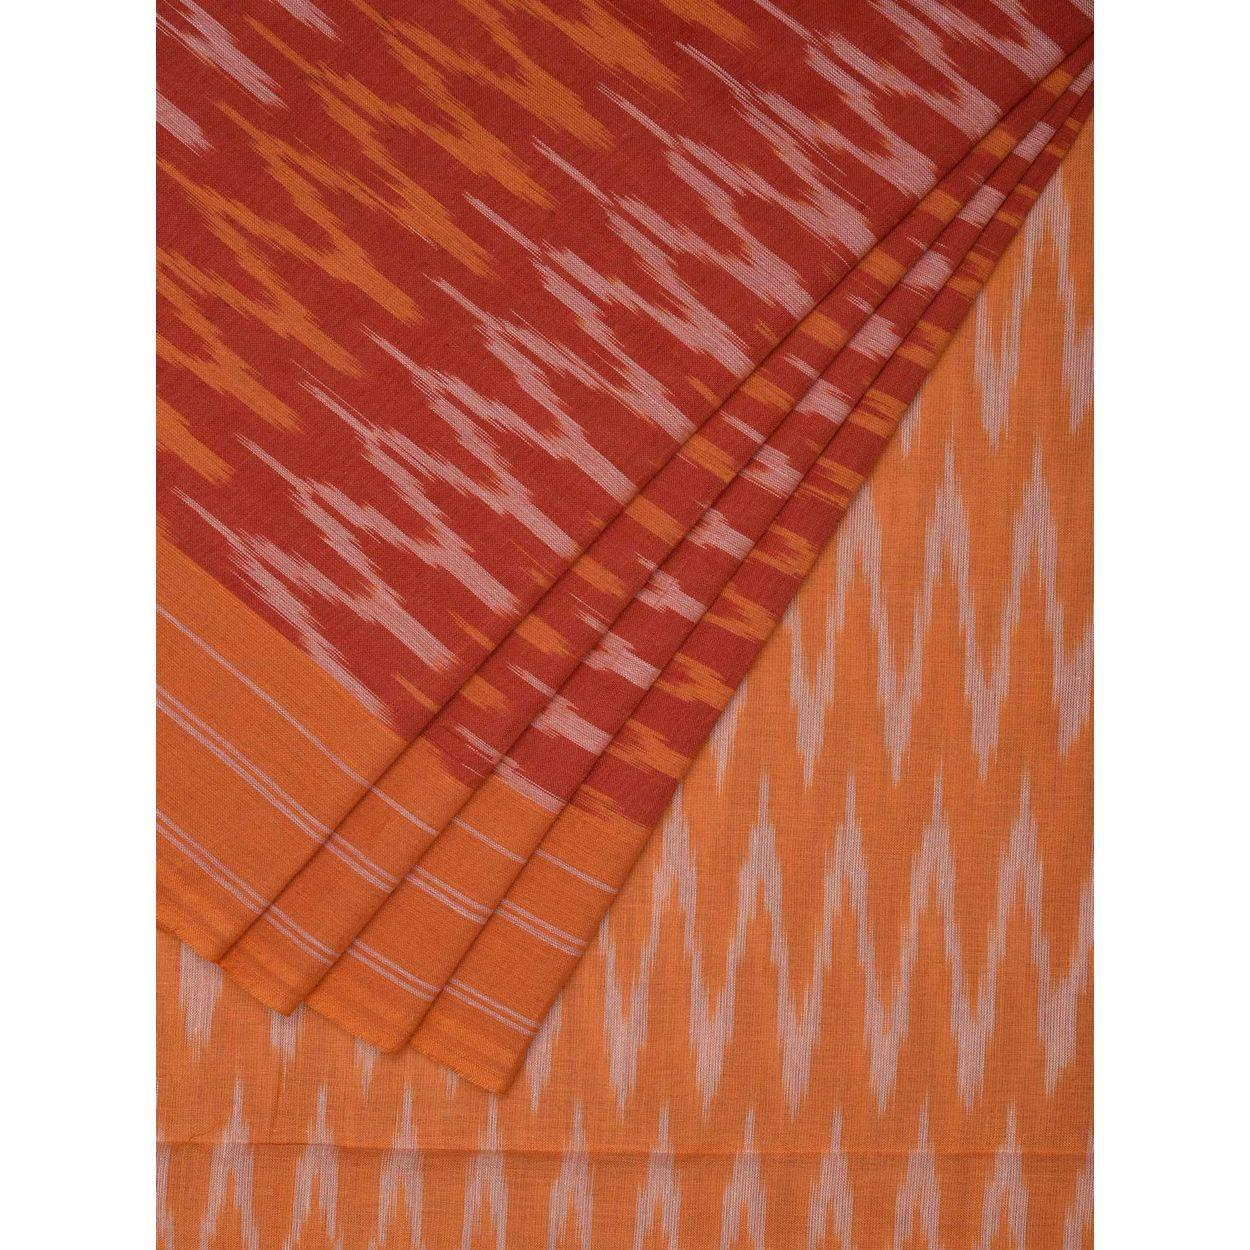 Orange Color Sari Pochampally Ikat Cotton Handloom Saree I0457 Blouse Zig Zag 1 2